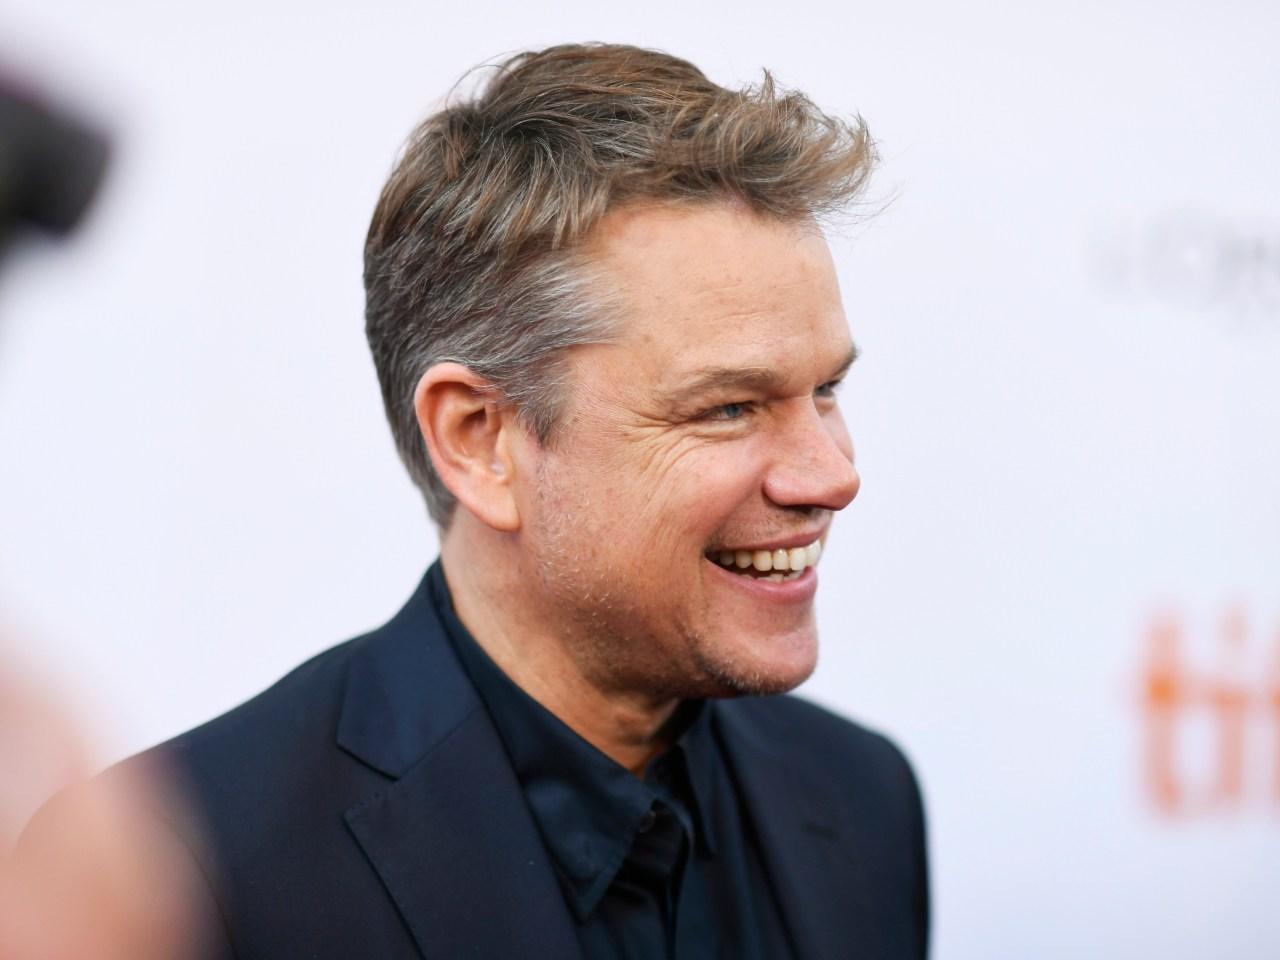 Watch: Trailer released for Matt Damon film 'Stillwater'